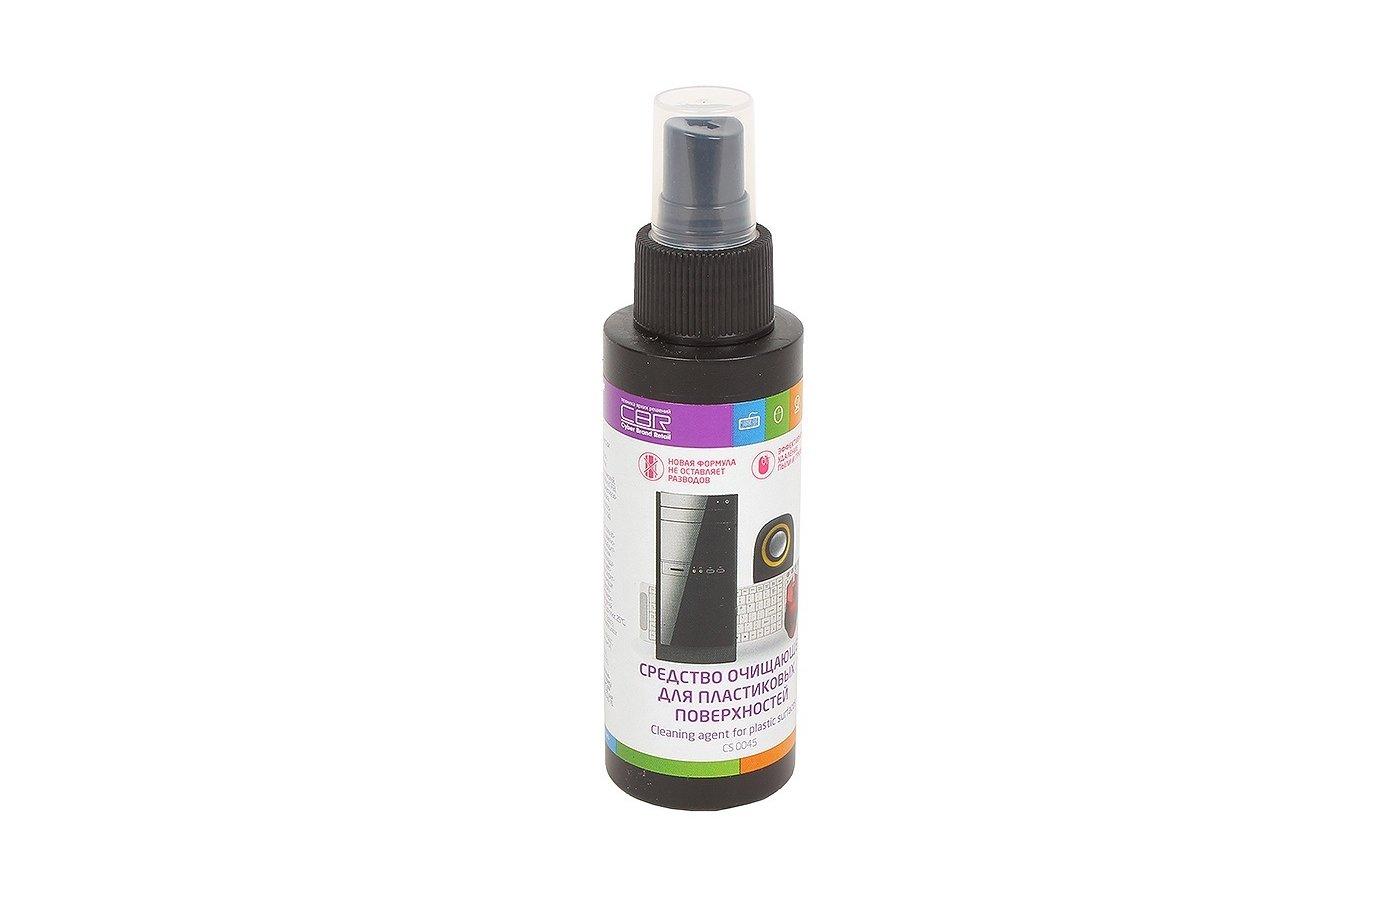 Чистящее средство CBR CS 0045 для пластика